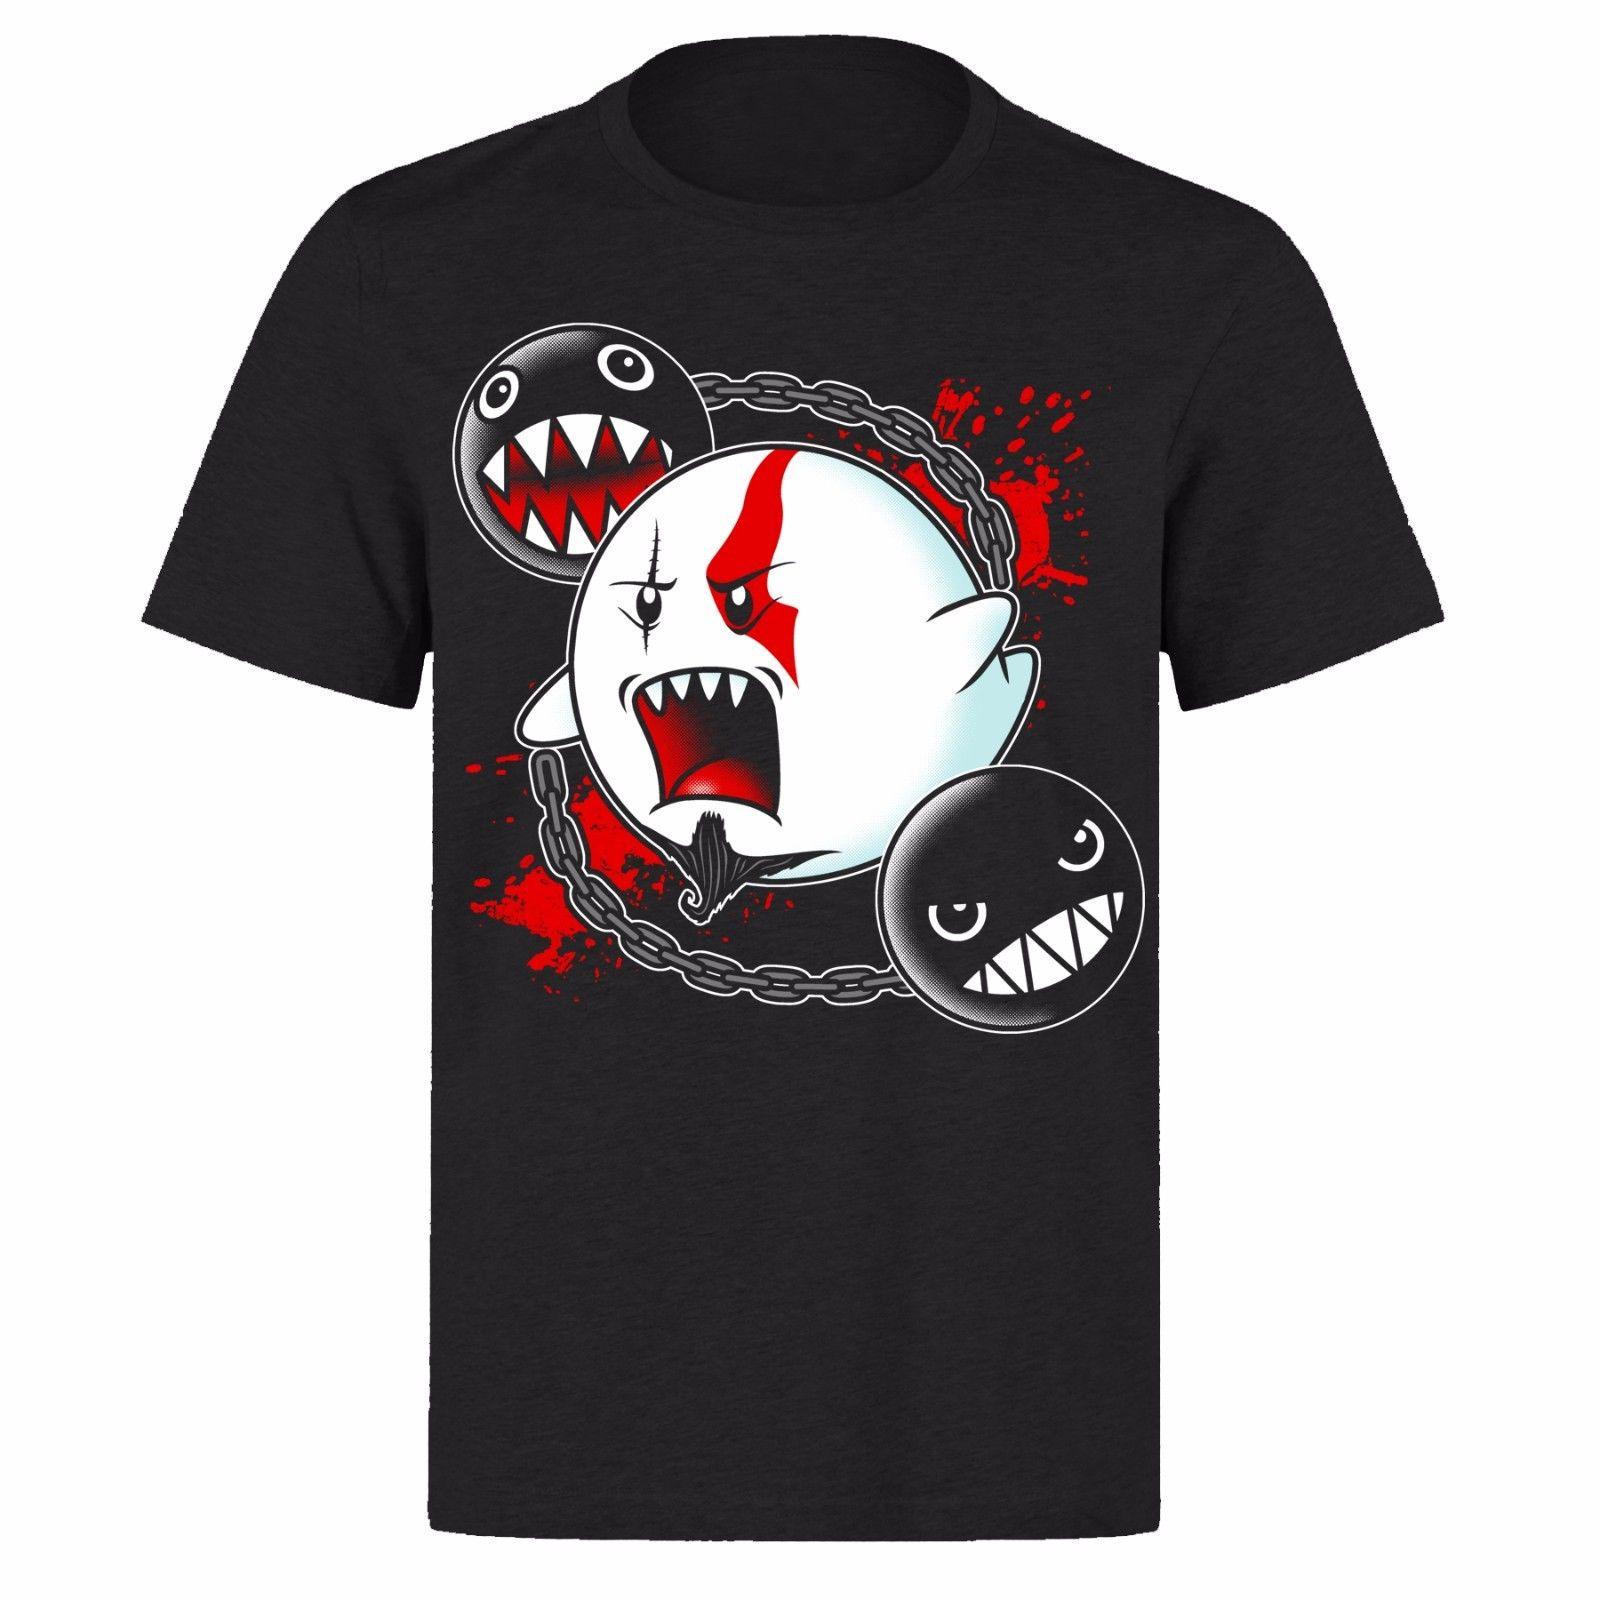 MARIO GHOST GODS OF WAR UNISEX BLACK CLASSIC GAMERS PH10 T-SHIRT Print T-Shirt Mens Short Tee Shirt Homme Tshirt Men Funny